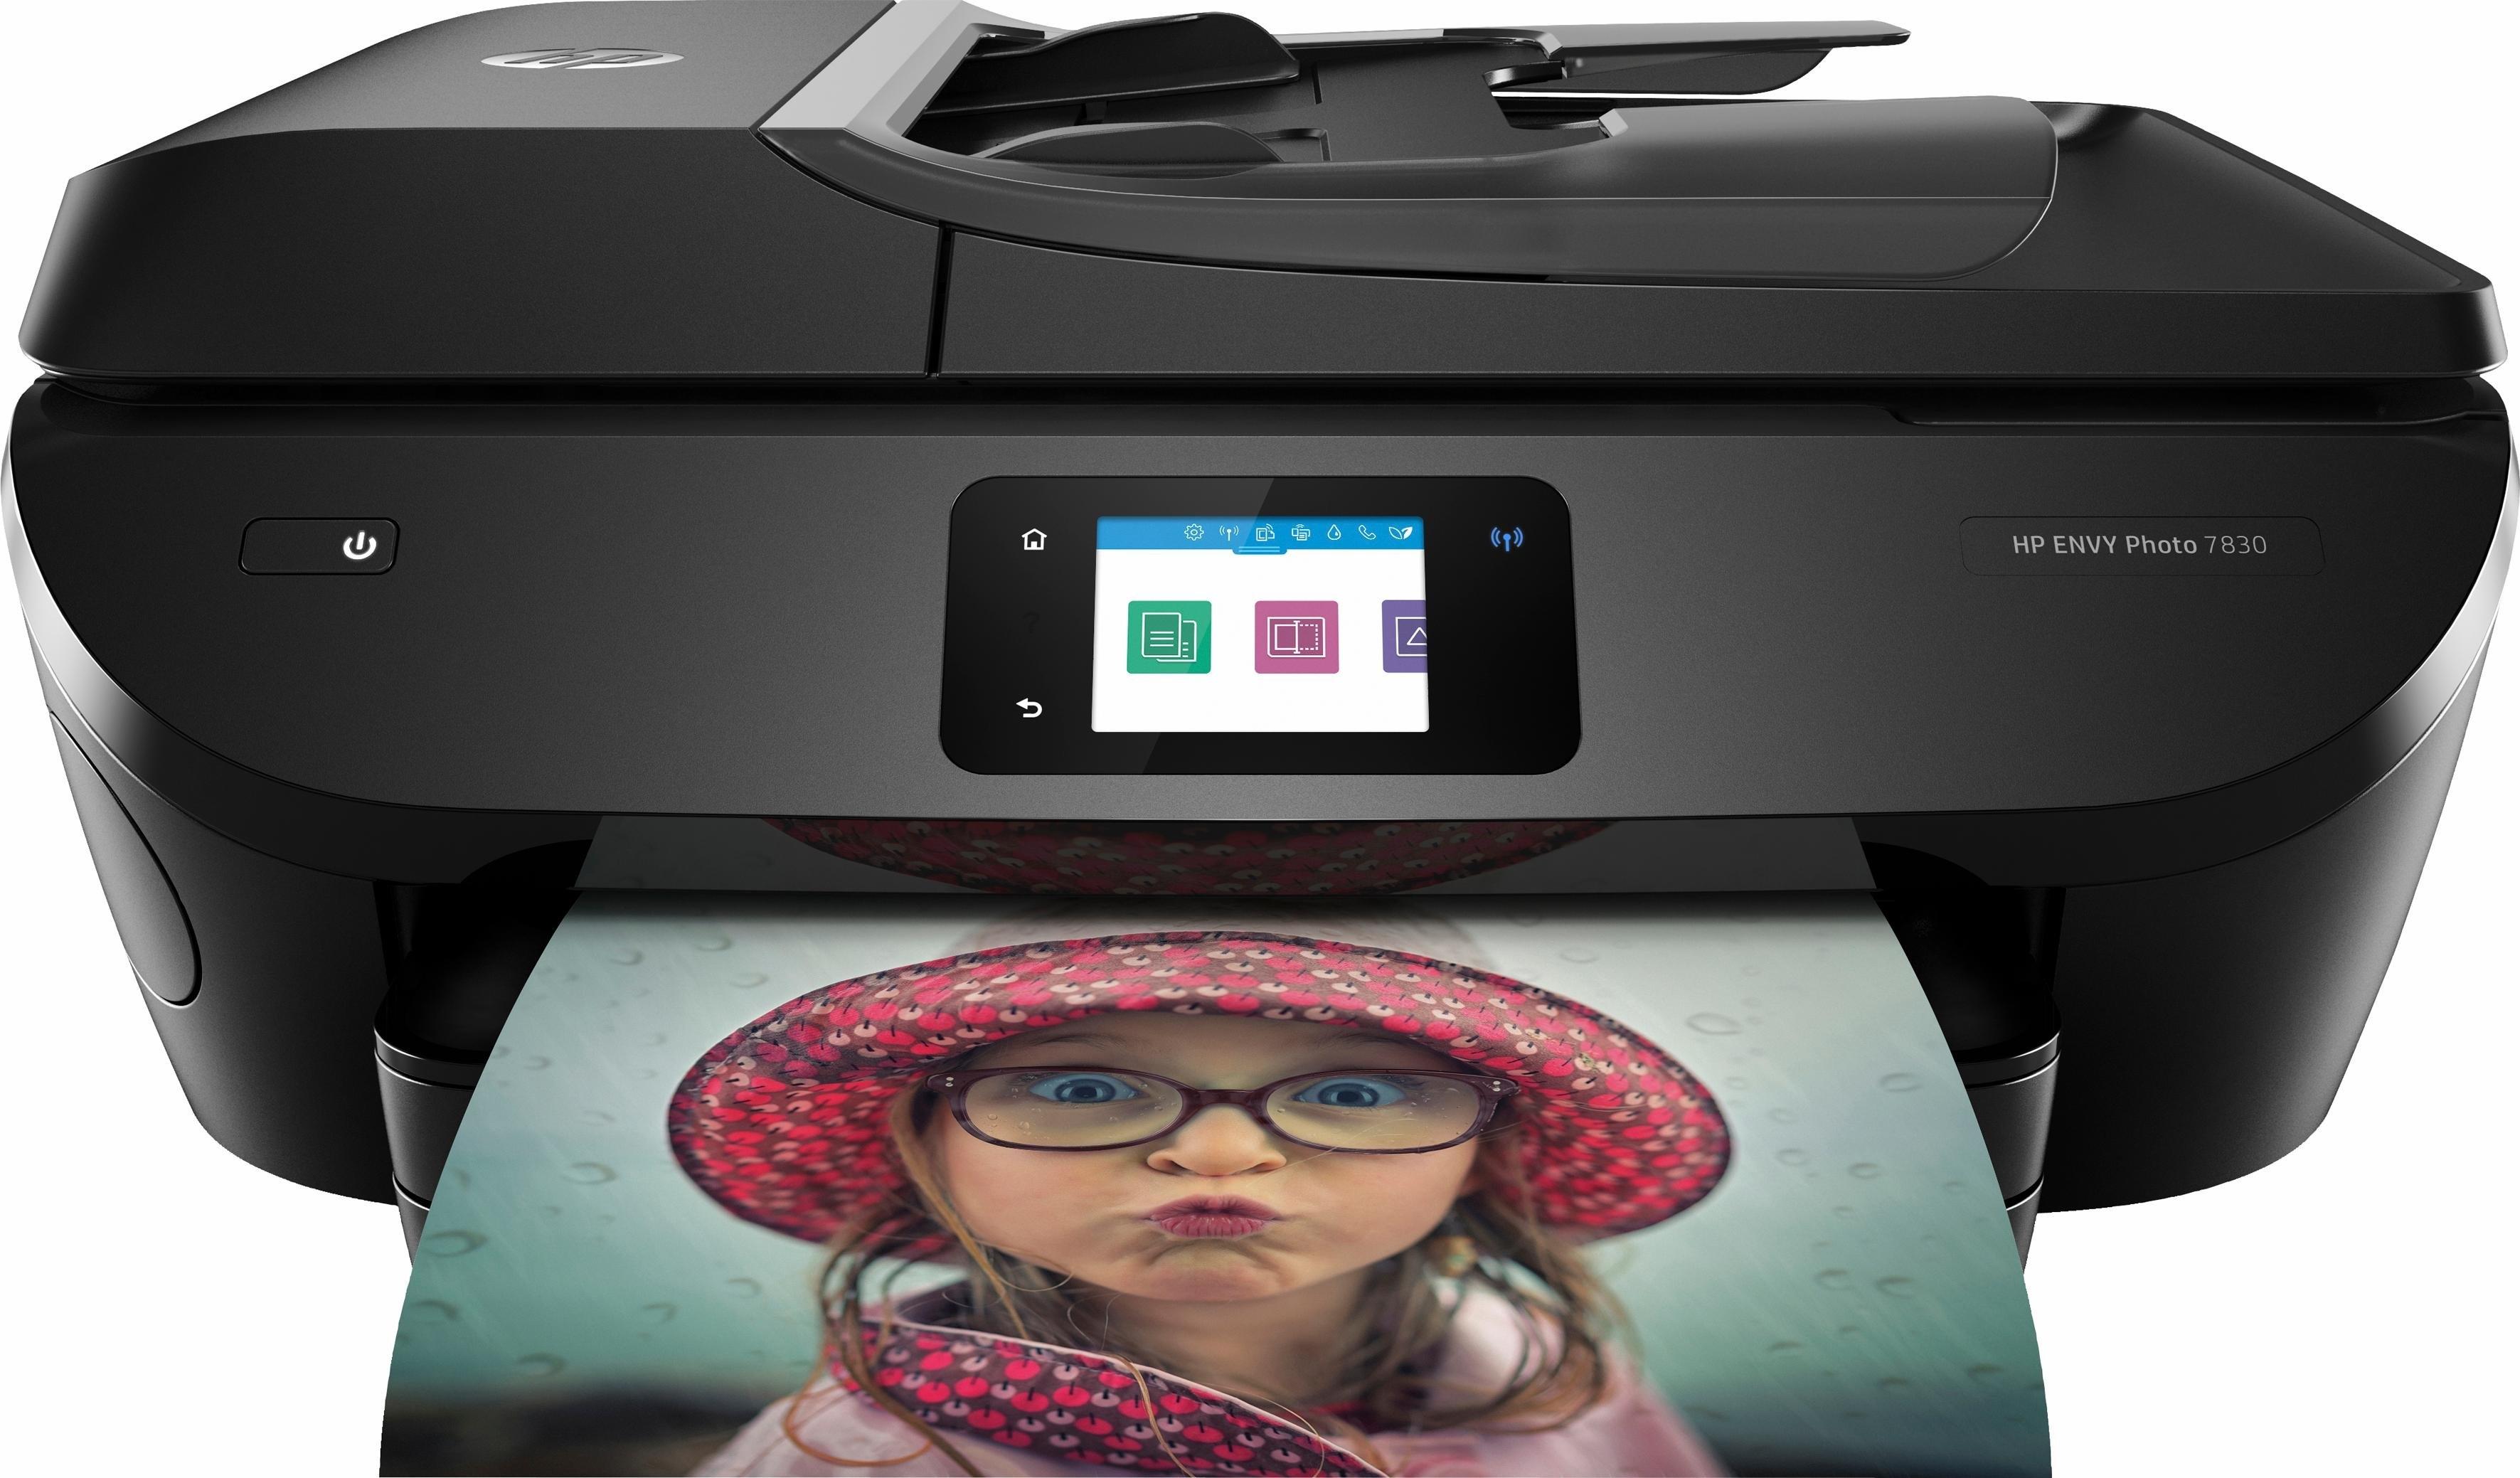 HP ENVY Photo 7830 all-in-oneprinter online kopen op otto.nl